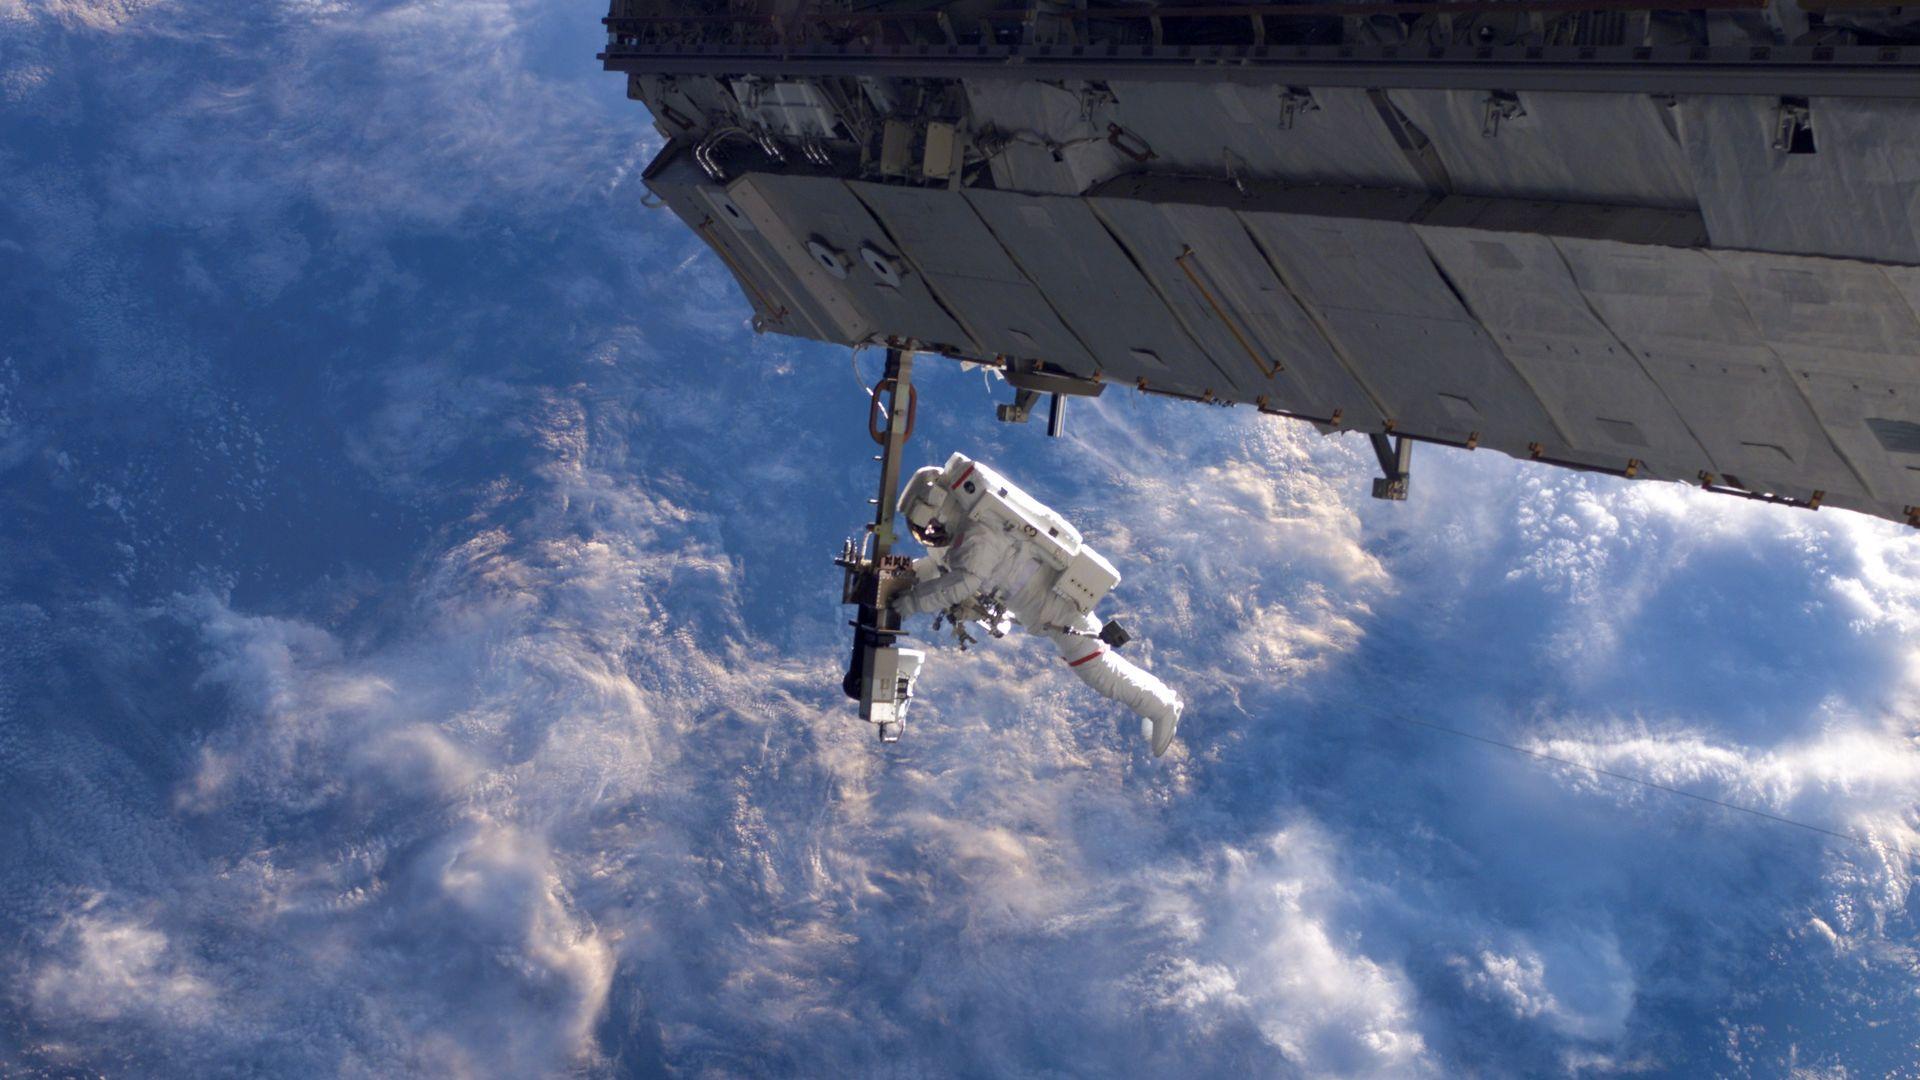 An astronaut on a spacewalk seen above the Earth